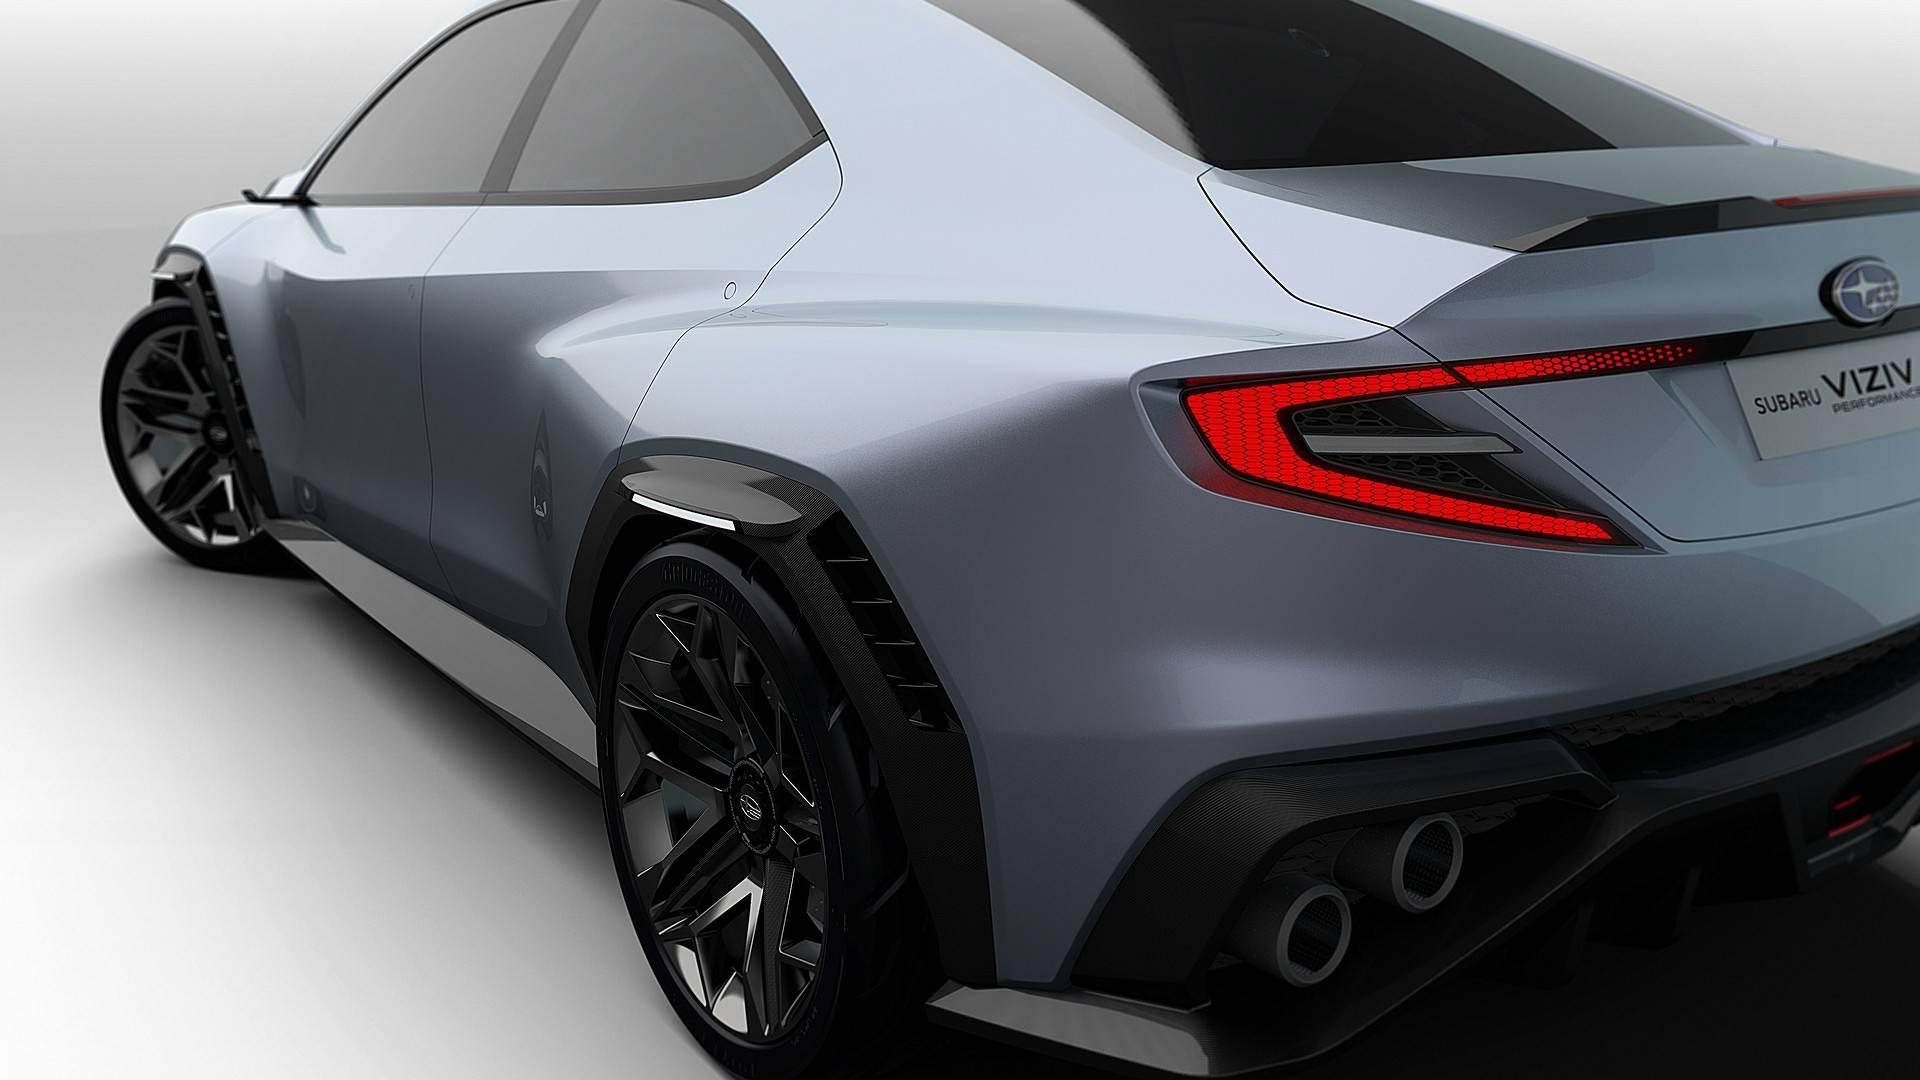 2018 Subaru Impreza WRX STI Rendered as a Hatchback ...